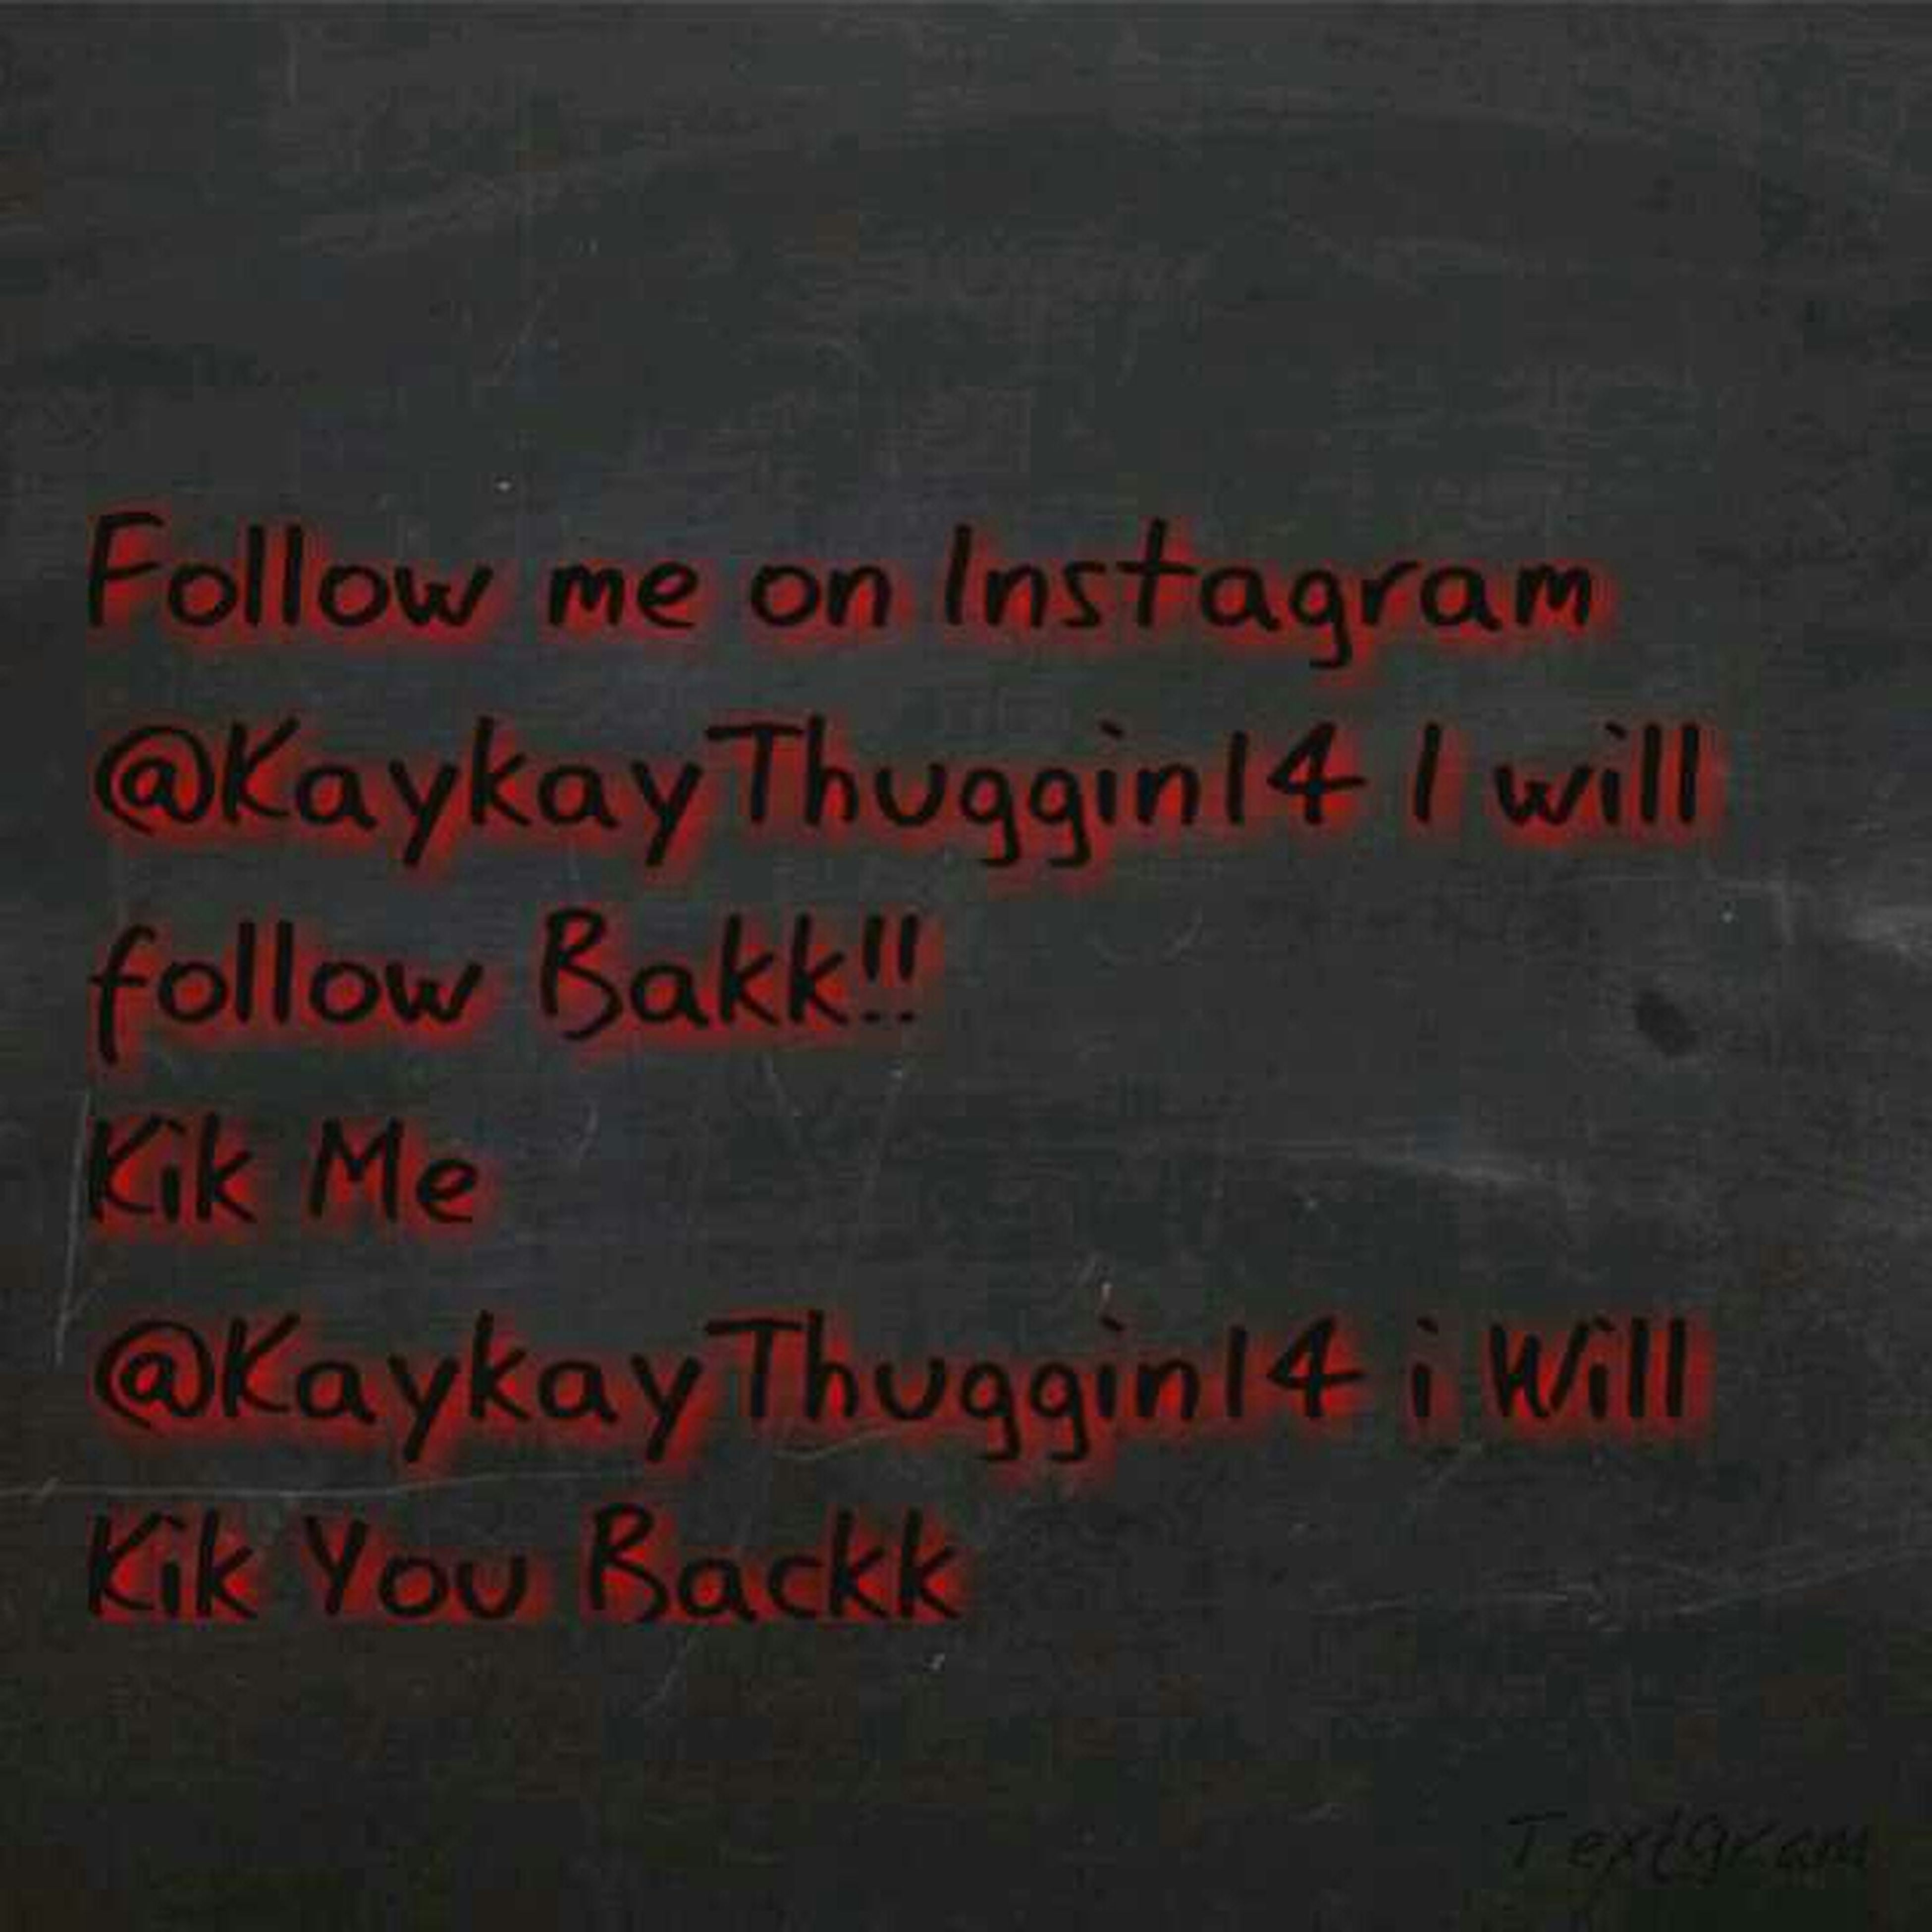 kik me :@KaykayThuggin14 and follow me on instagram:@KaykayThuggin14....:)